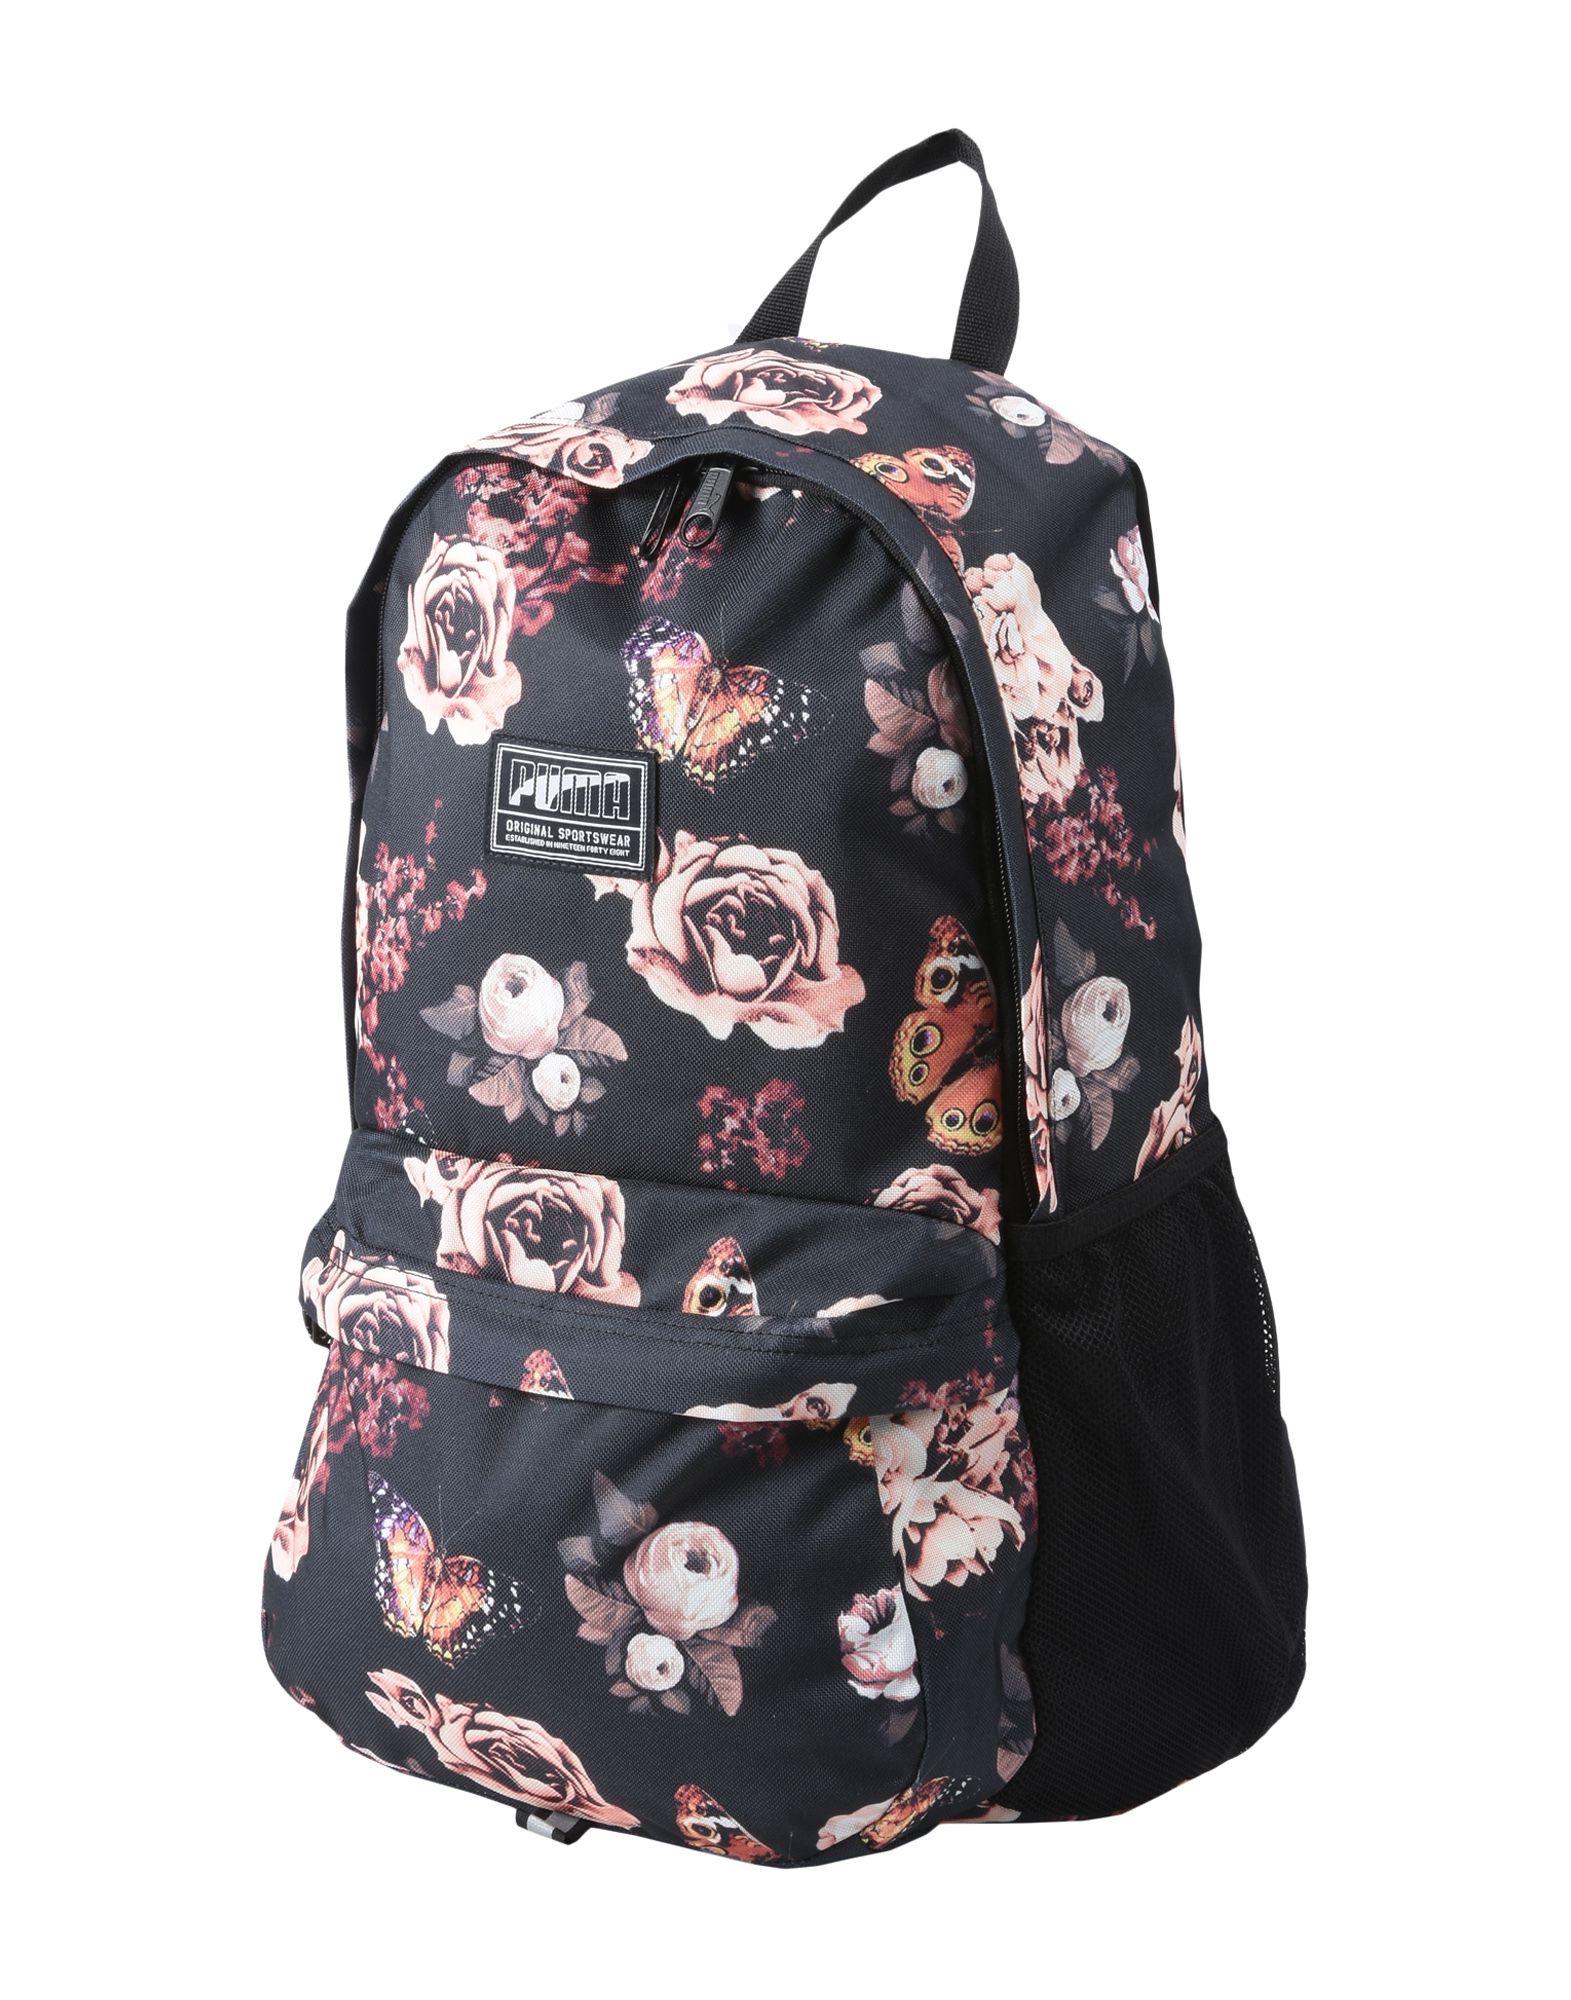 41d478d63cc Puma Backpacks   Fanny Packs In Black   ModeSens